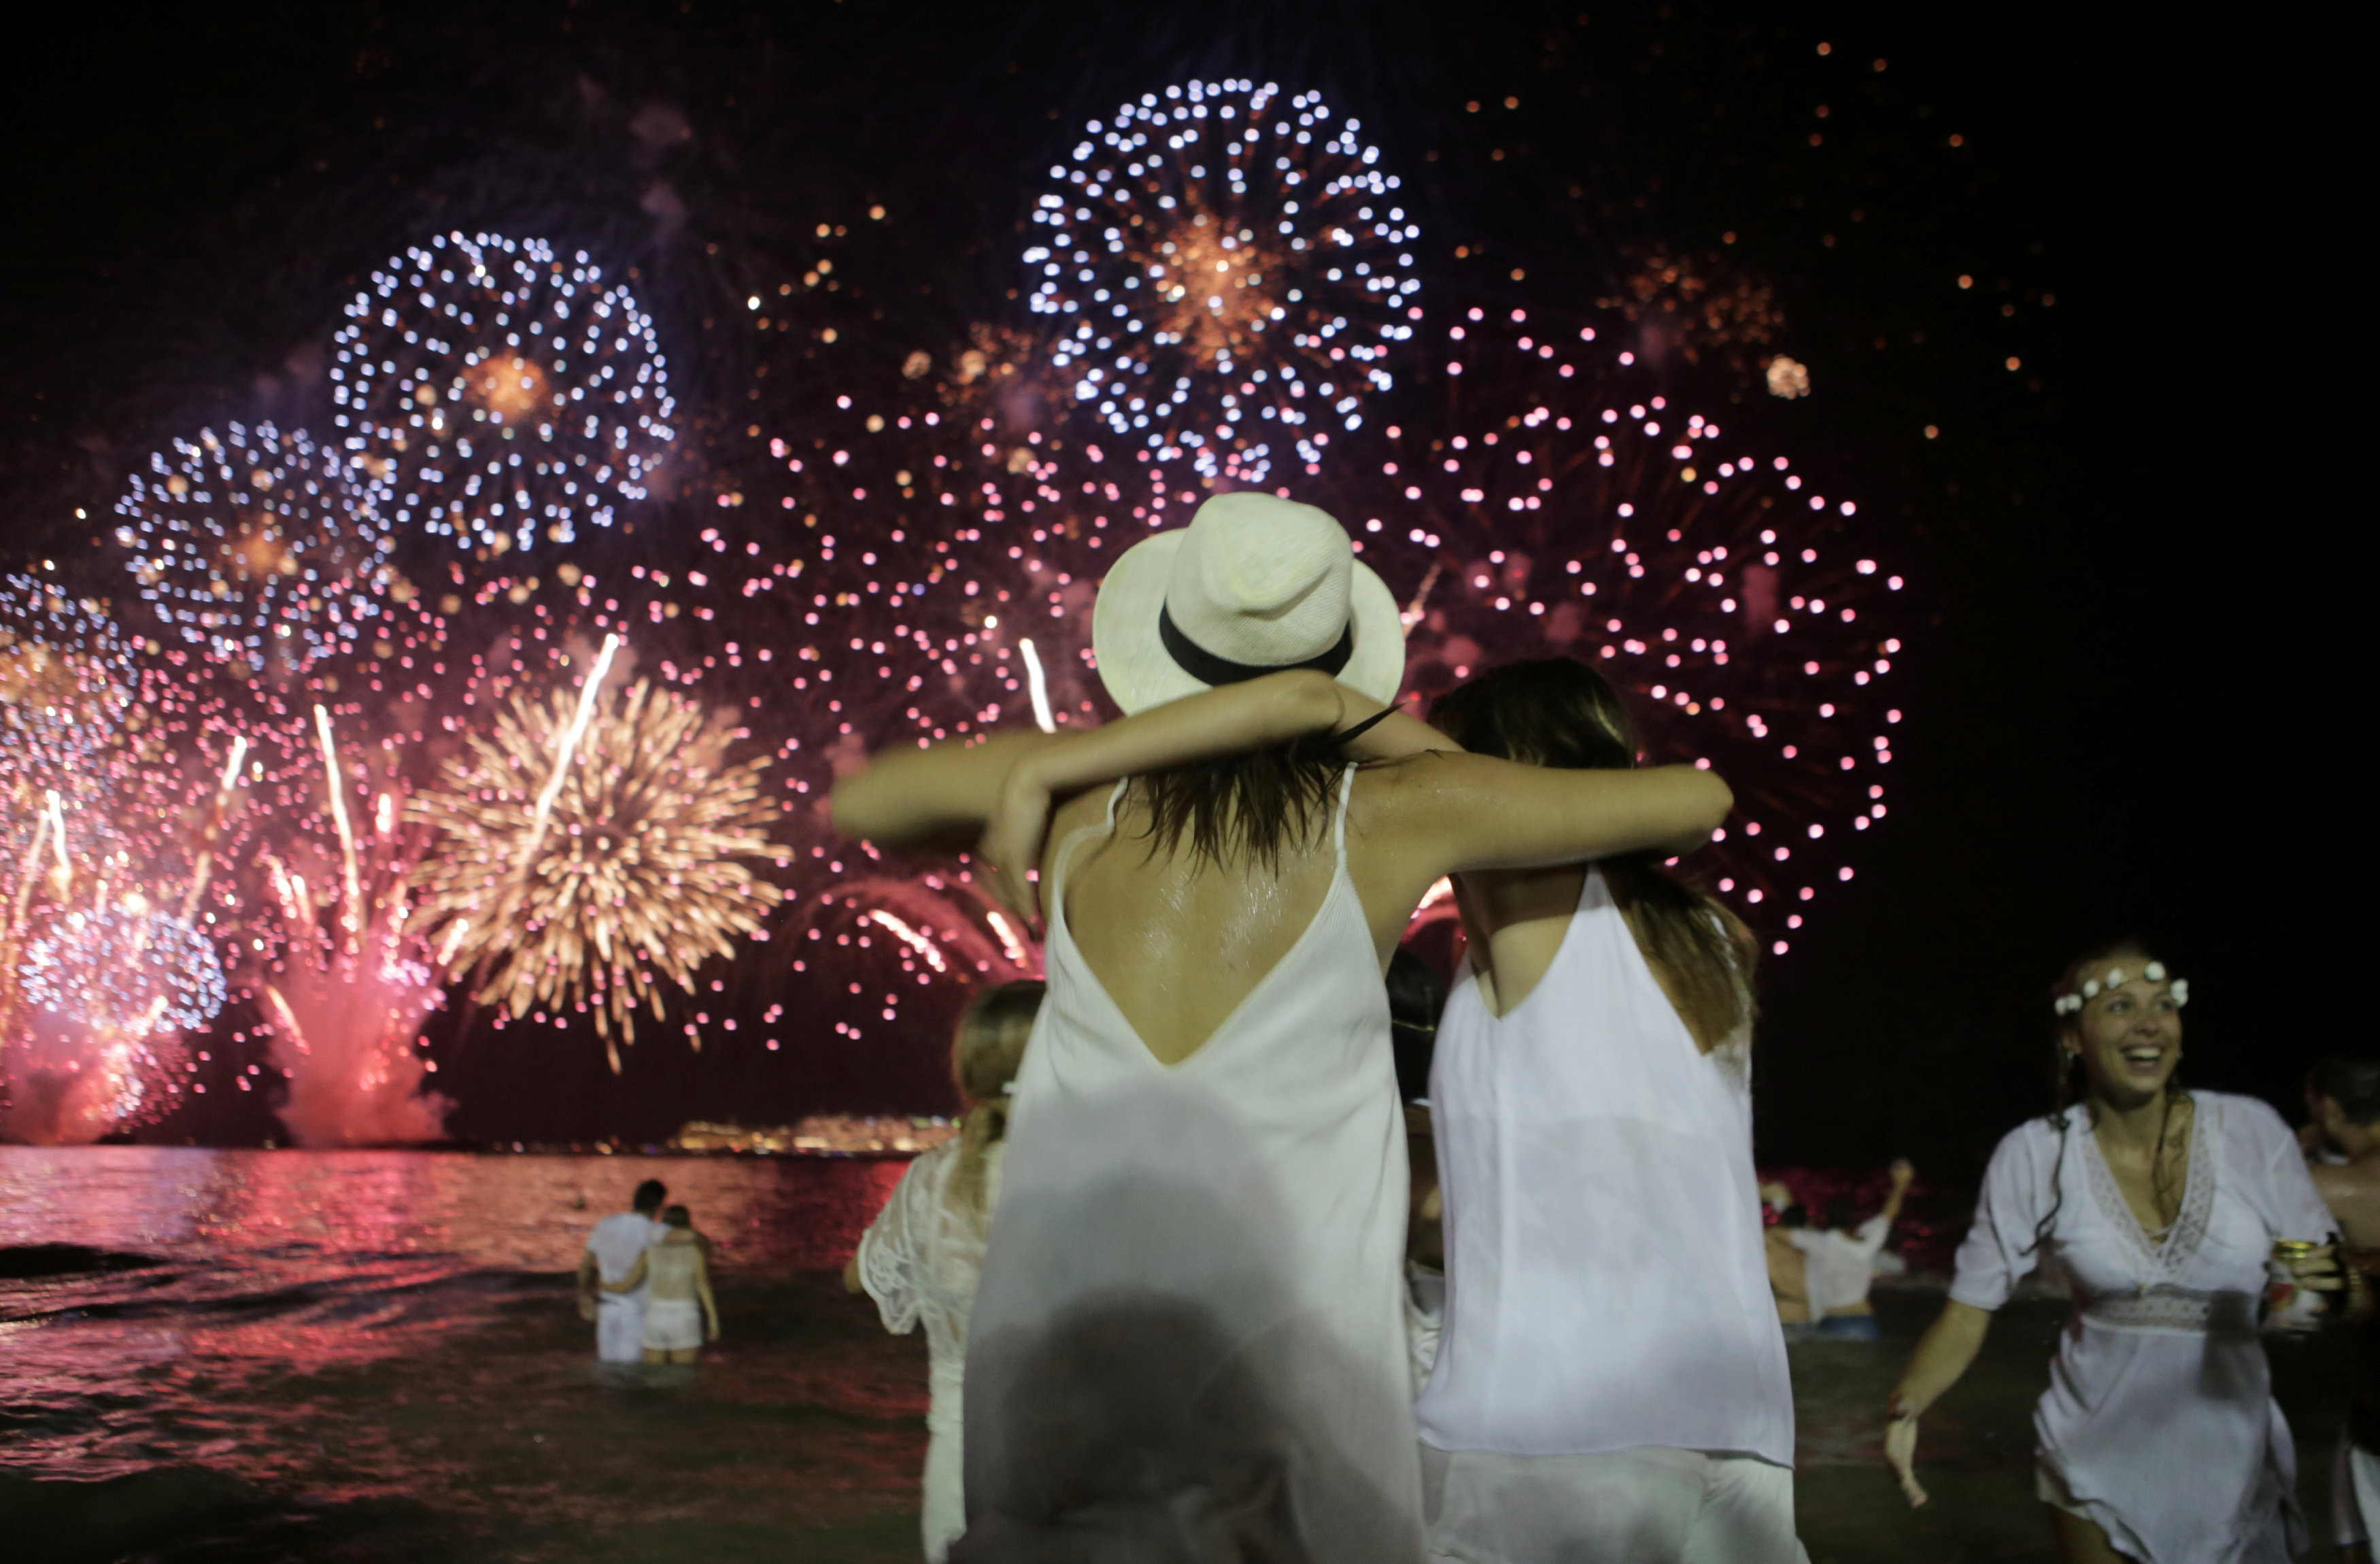 Fuegos en la playa de Copacabana, Río de Janeiro, Brasil (REUTERS/Raquel Cunha)